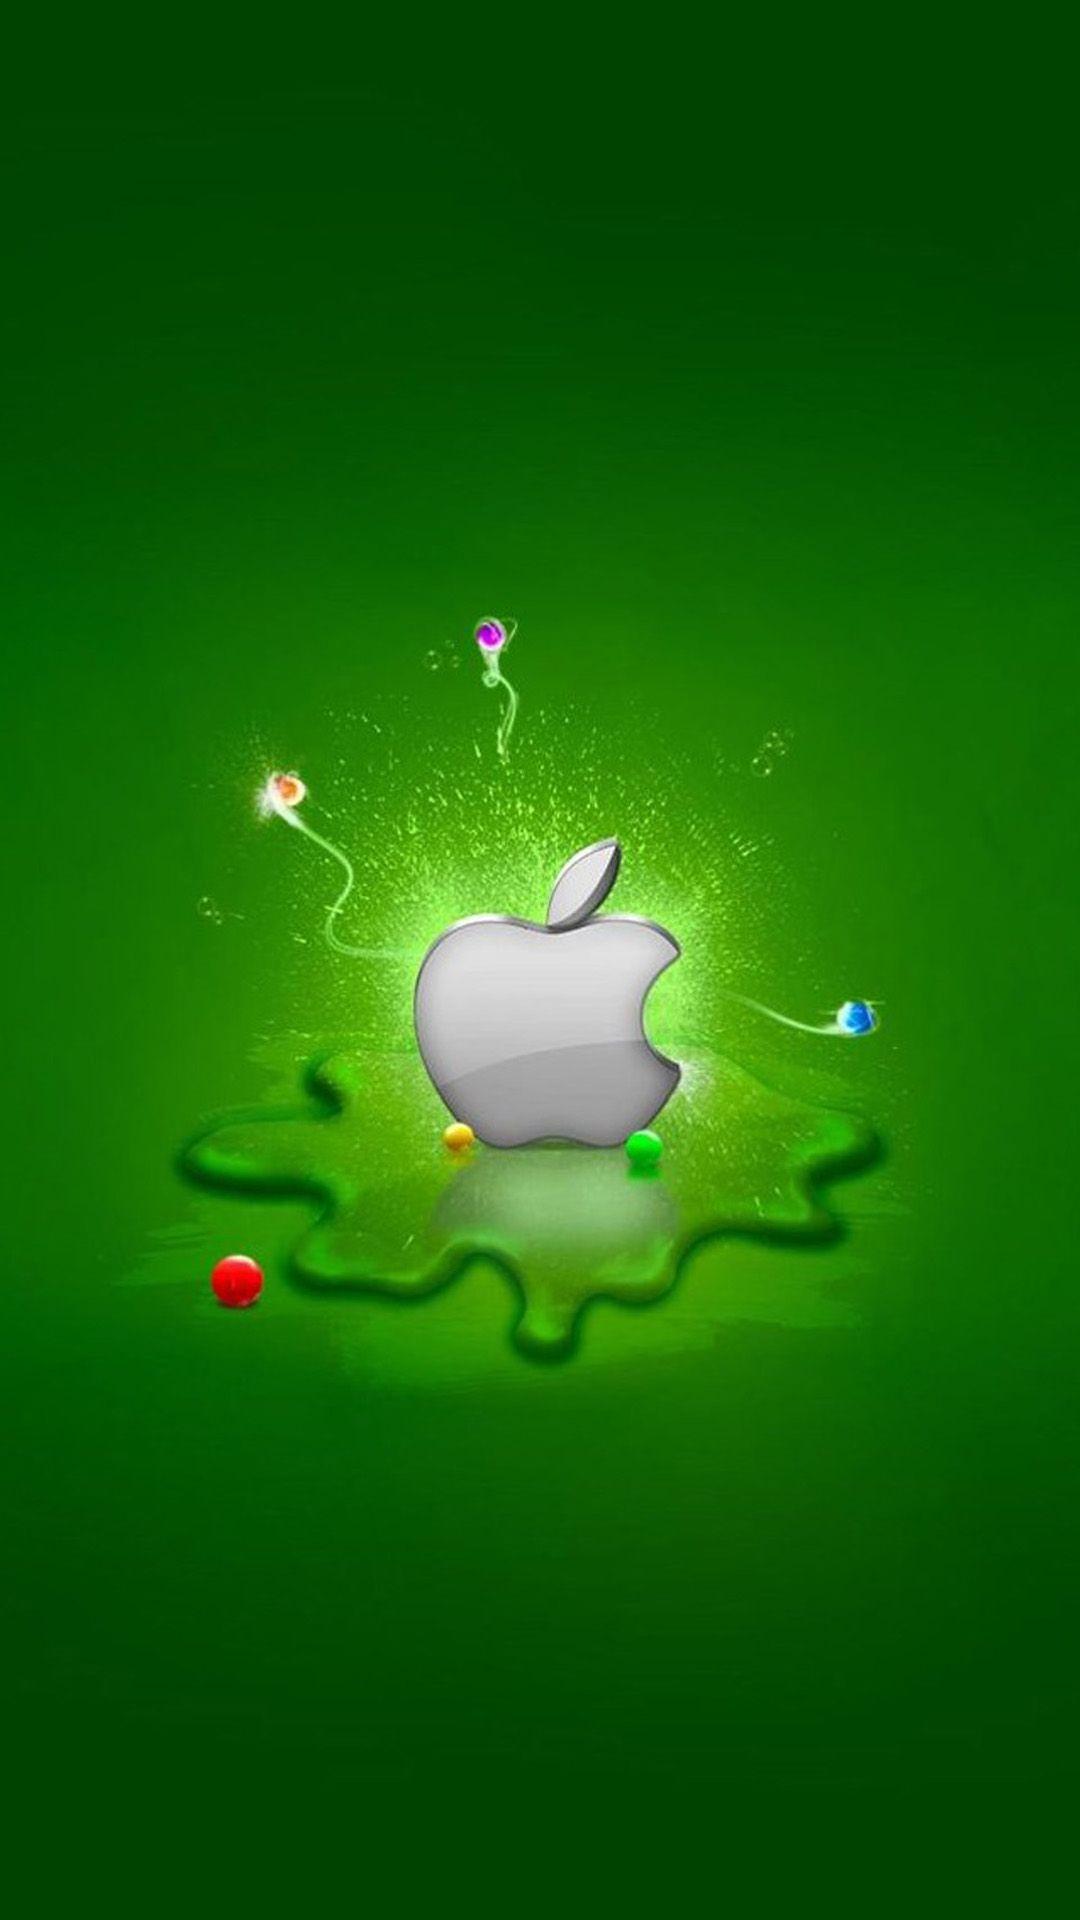 Apple Iphone 6 Hd Original Wallpapers Wallpaper Cave